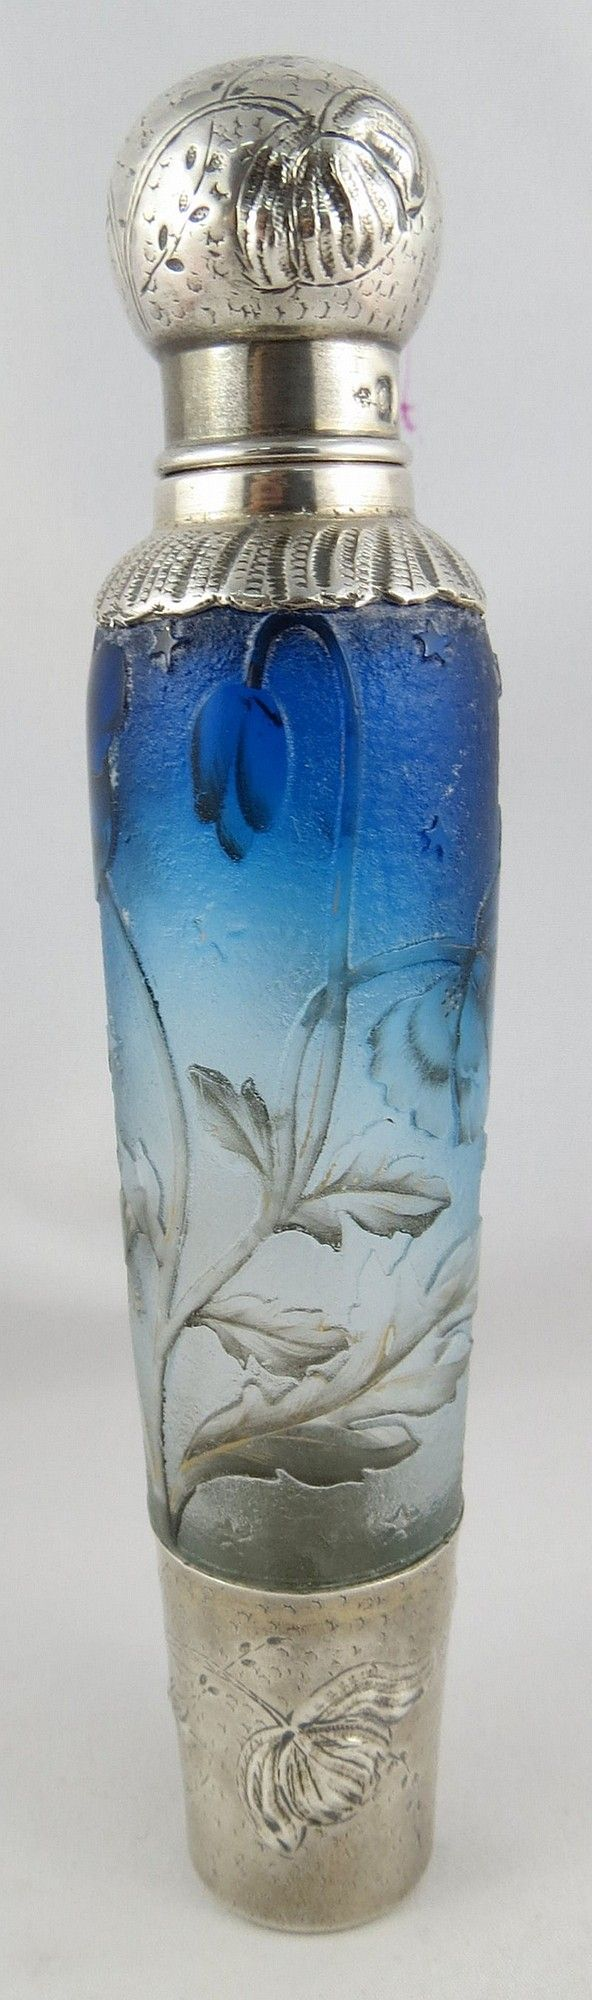 "Antique Art Nouveau Daum Nancy Sterling Silver And Cameo Glass Flask, Signed ""Daum"" - French"